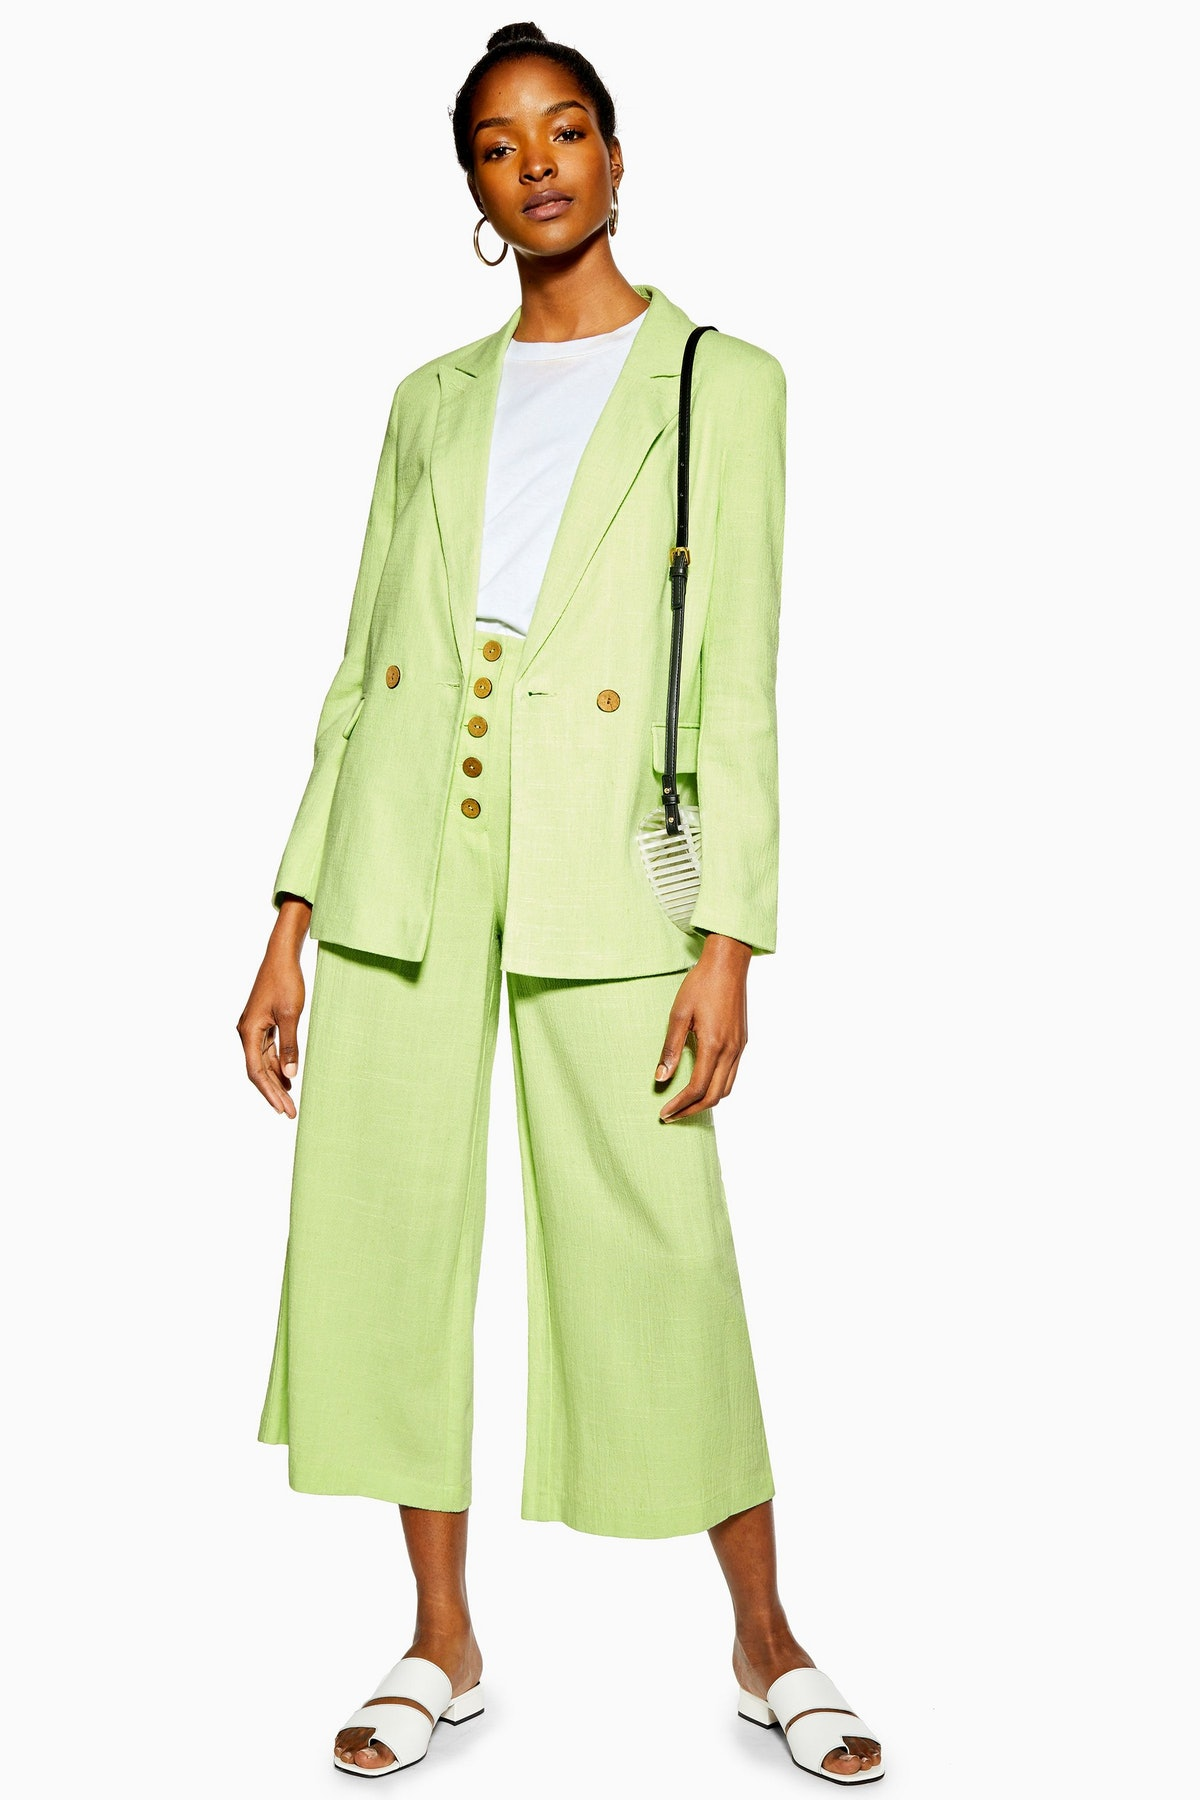 Apple Green Suit